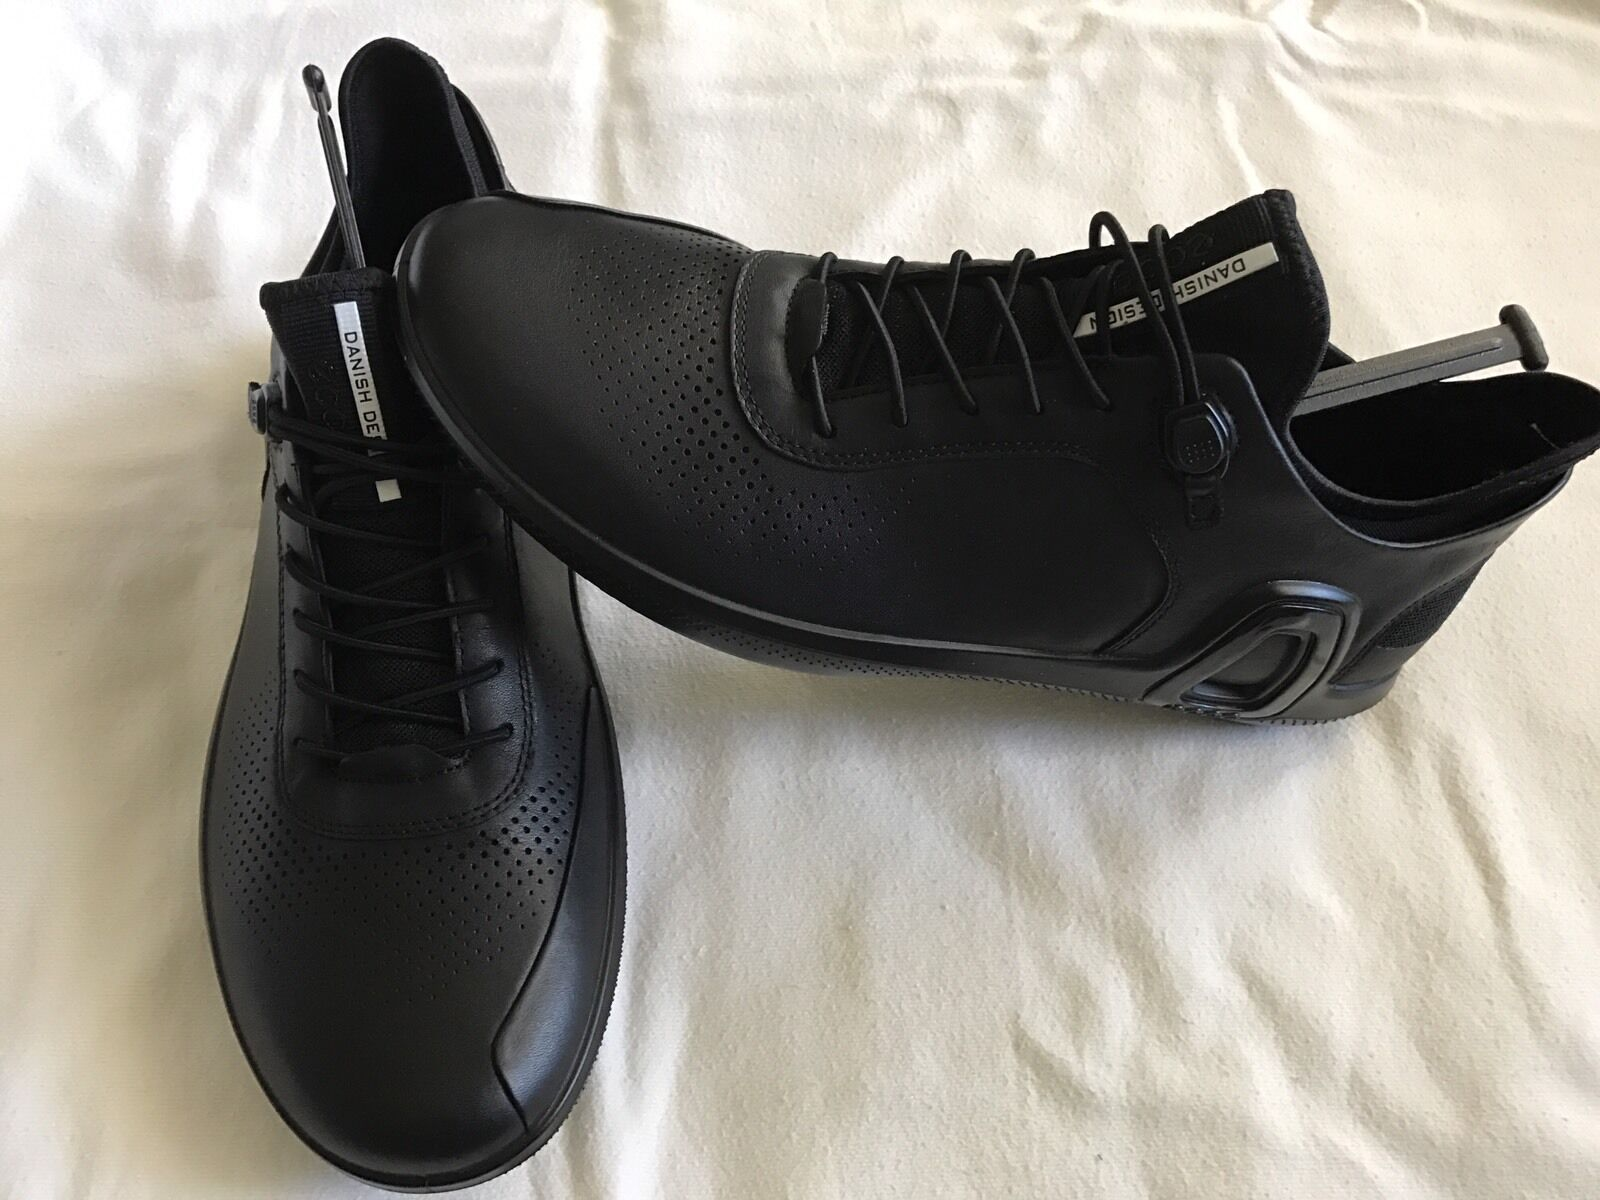 ECCO  Sneakers Danish Leather BLACK Brand New iN box 42-43 size US 9-9.5